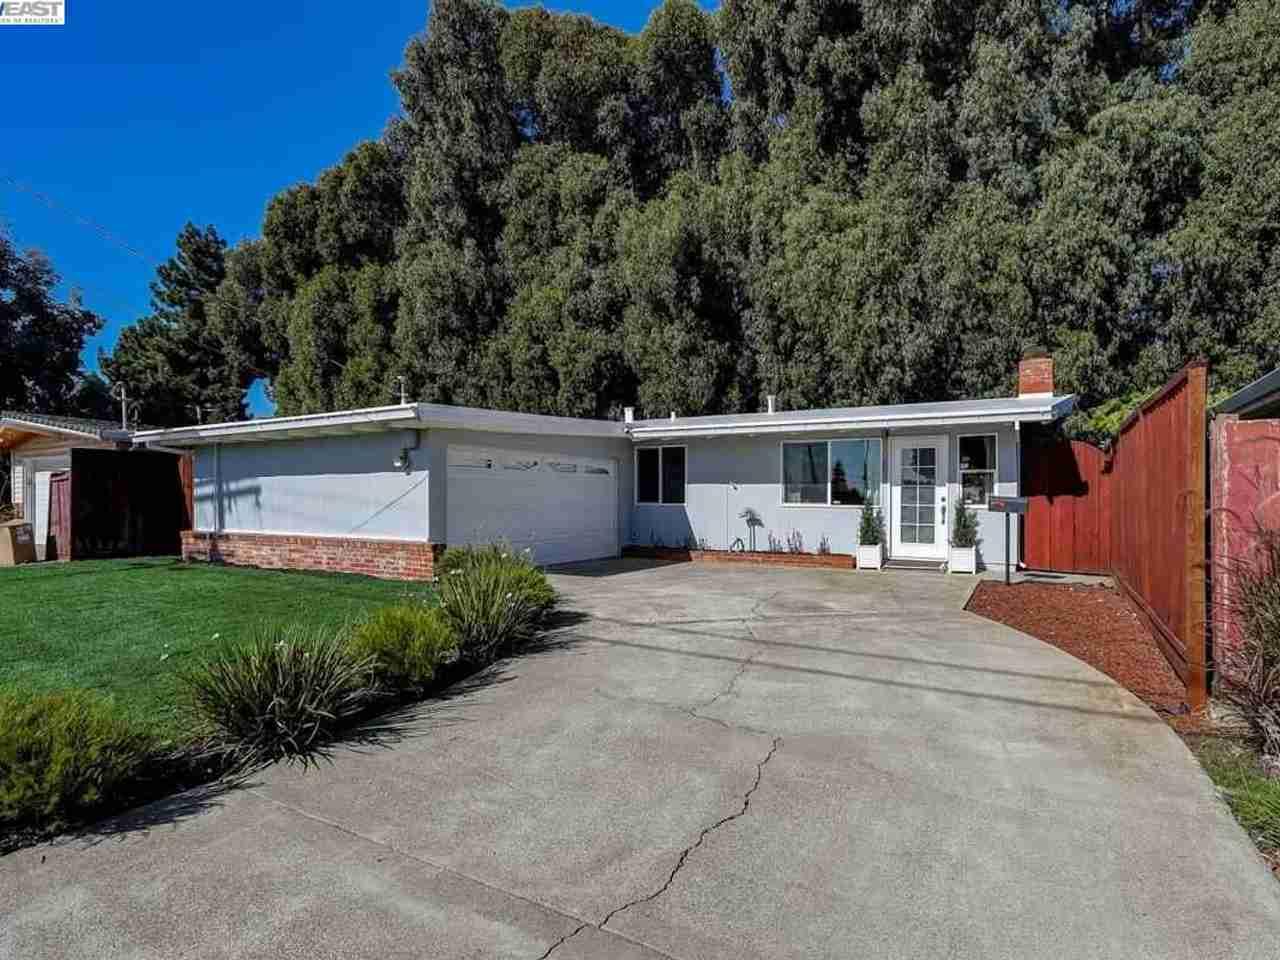 1259 Rieger Ave Hayward, CA, 94544